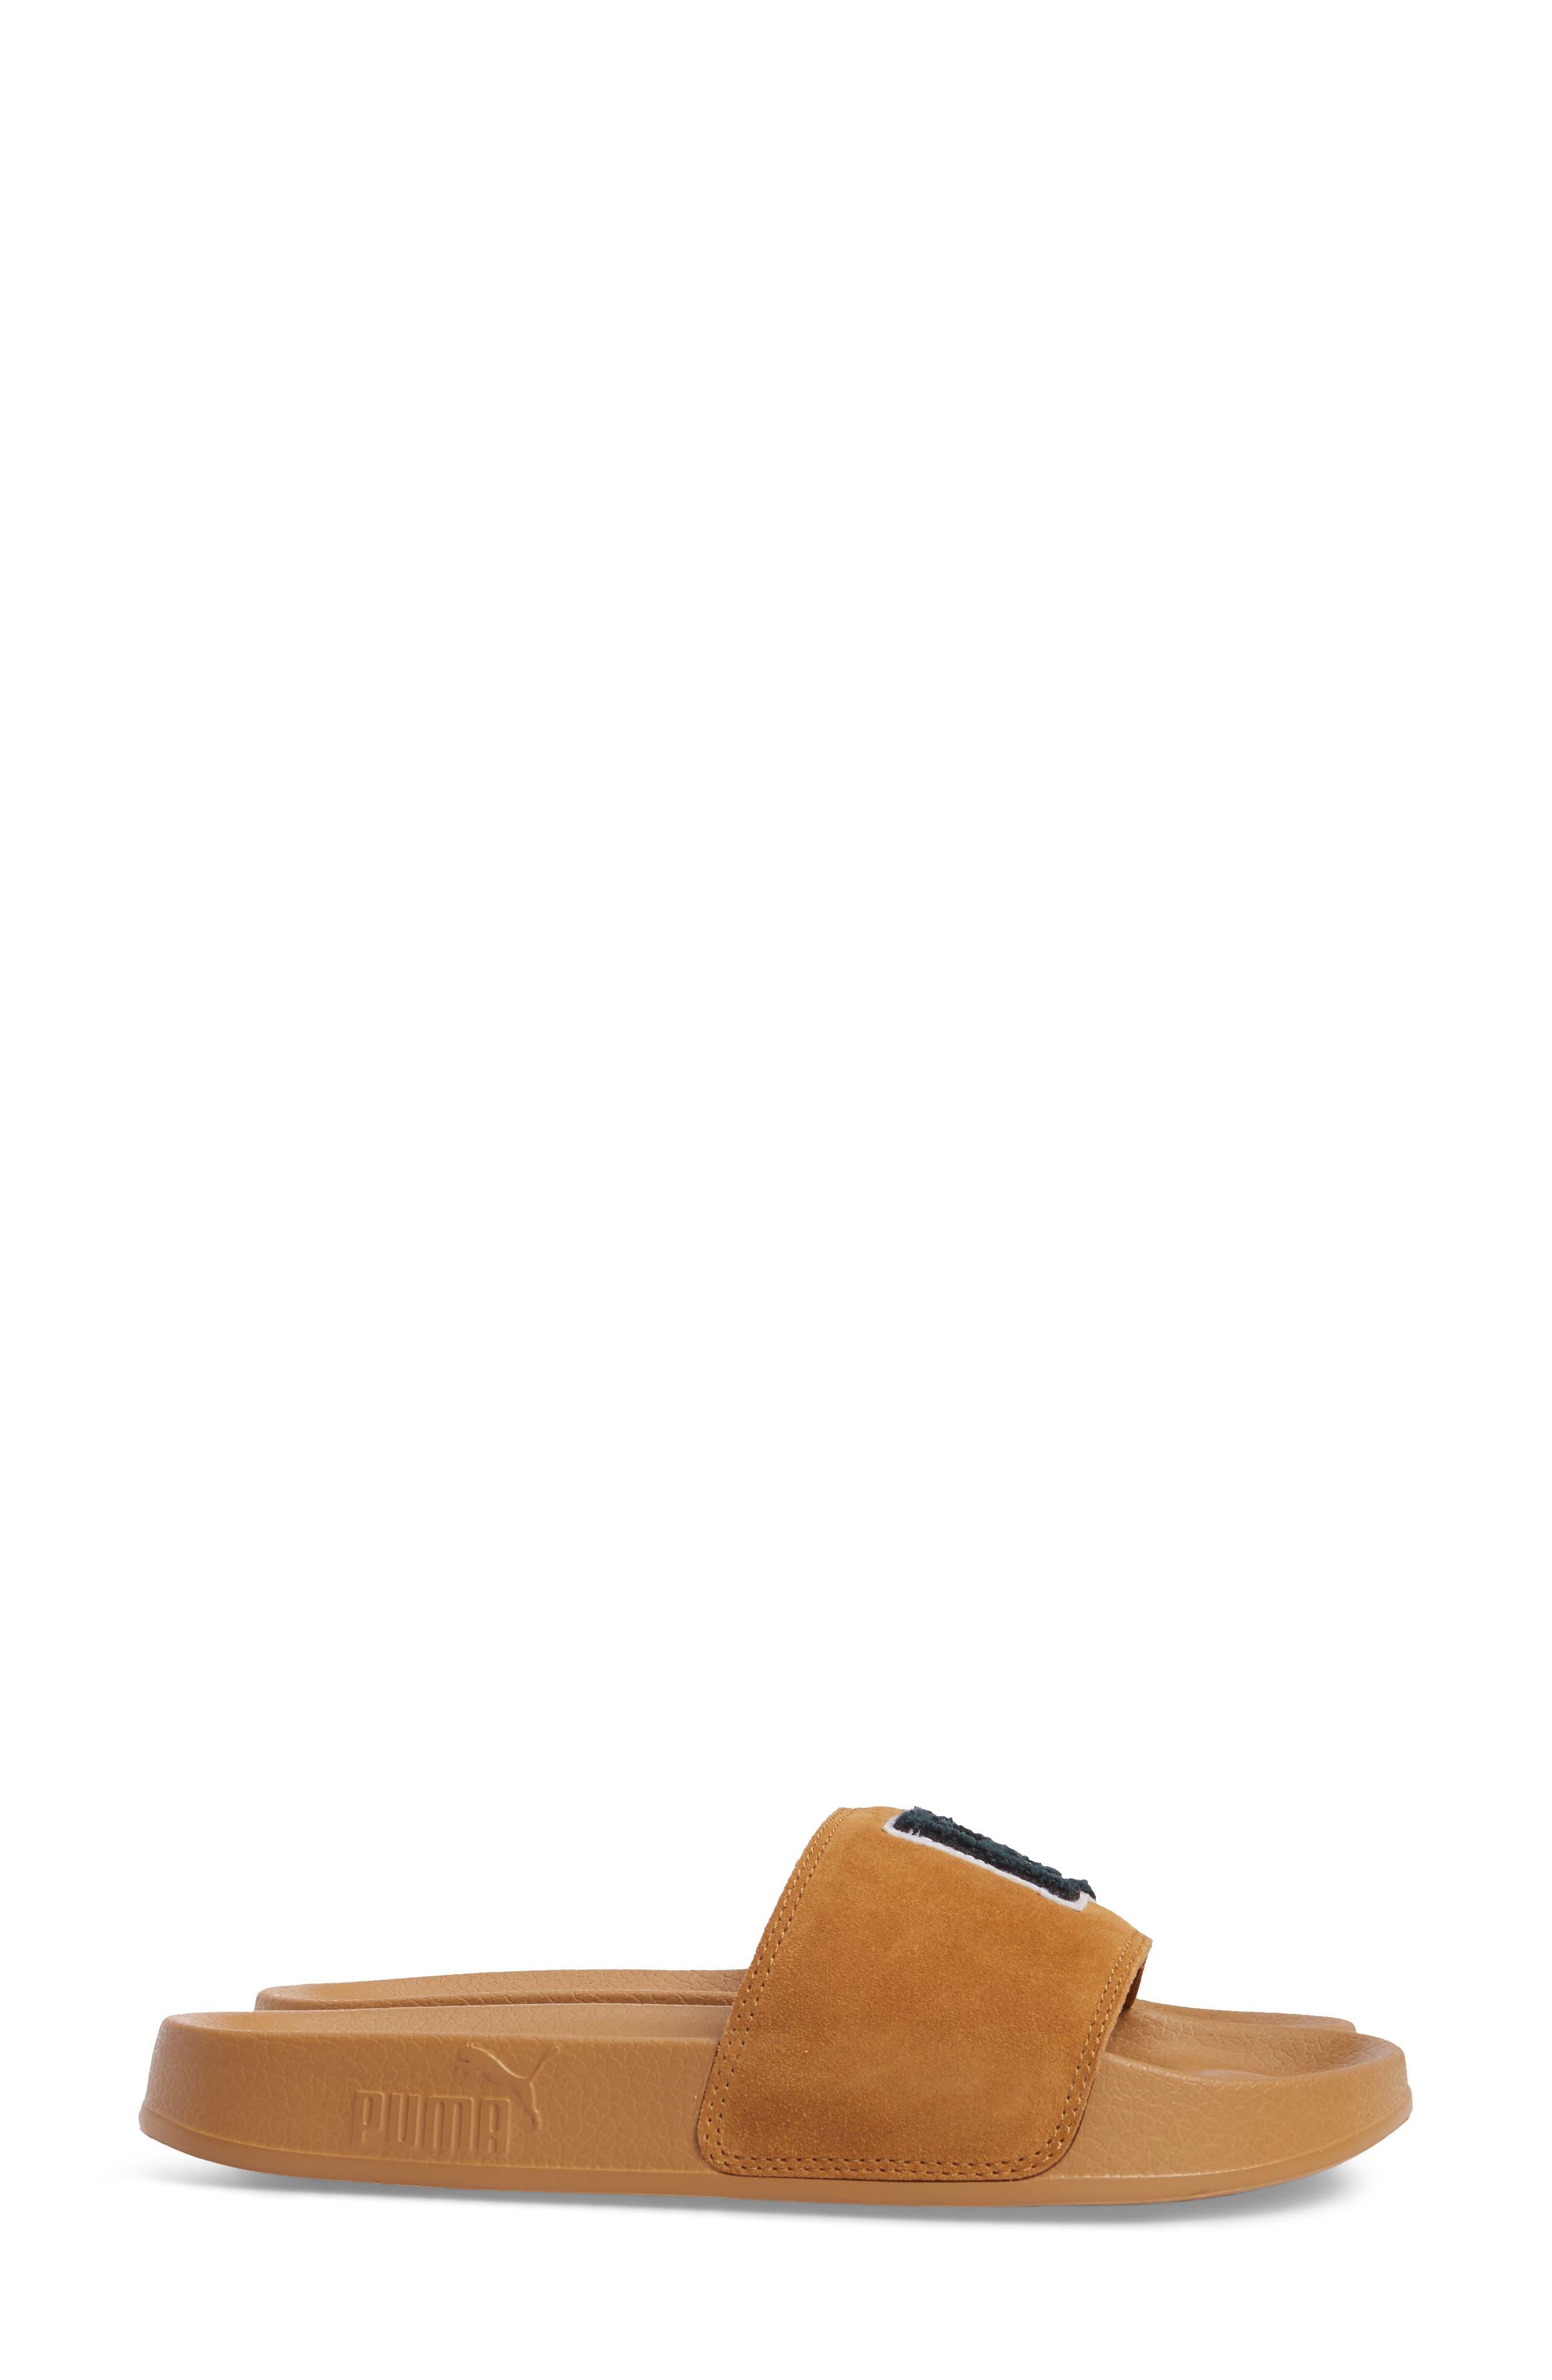 FENTY PUMA by Rihanna Lead Cat Slide Sandals,                             Alternate thumbnail 12, color,